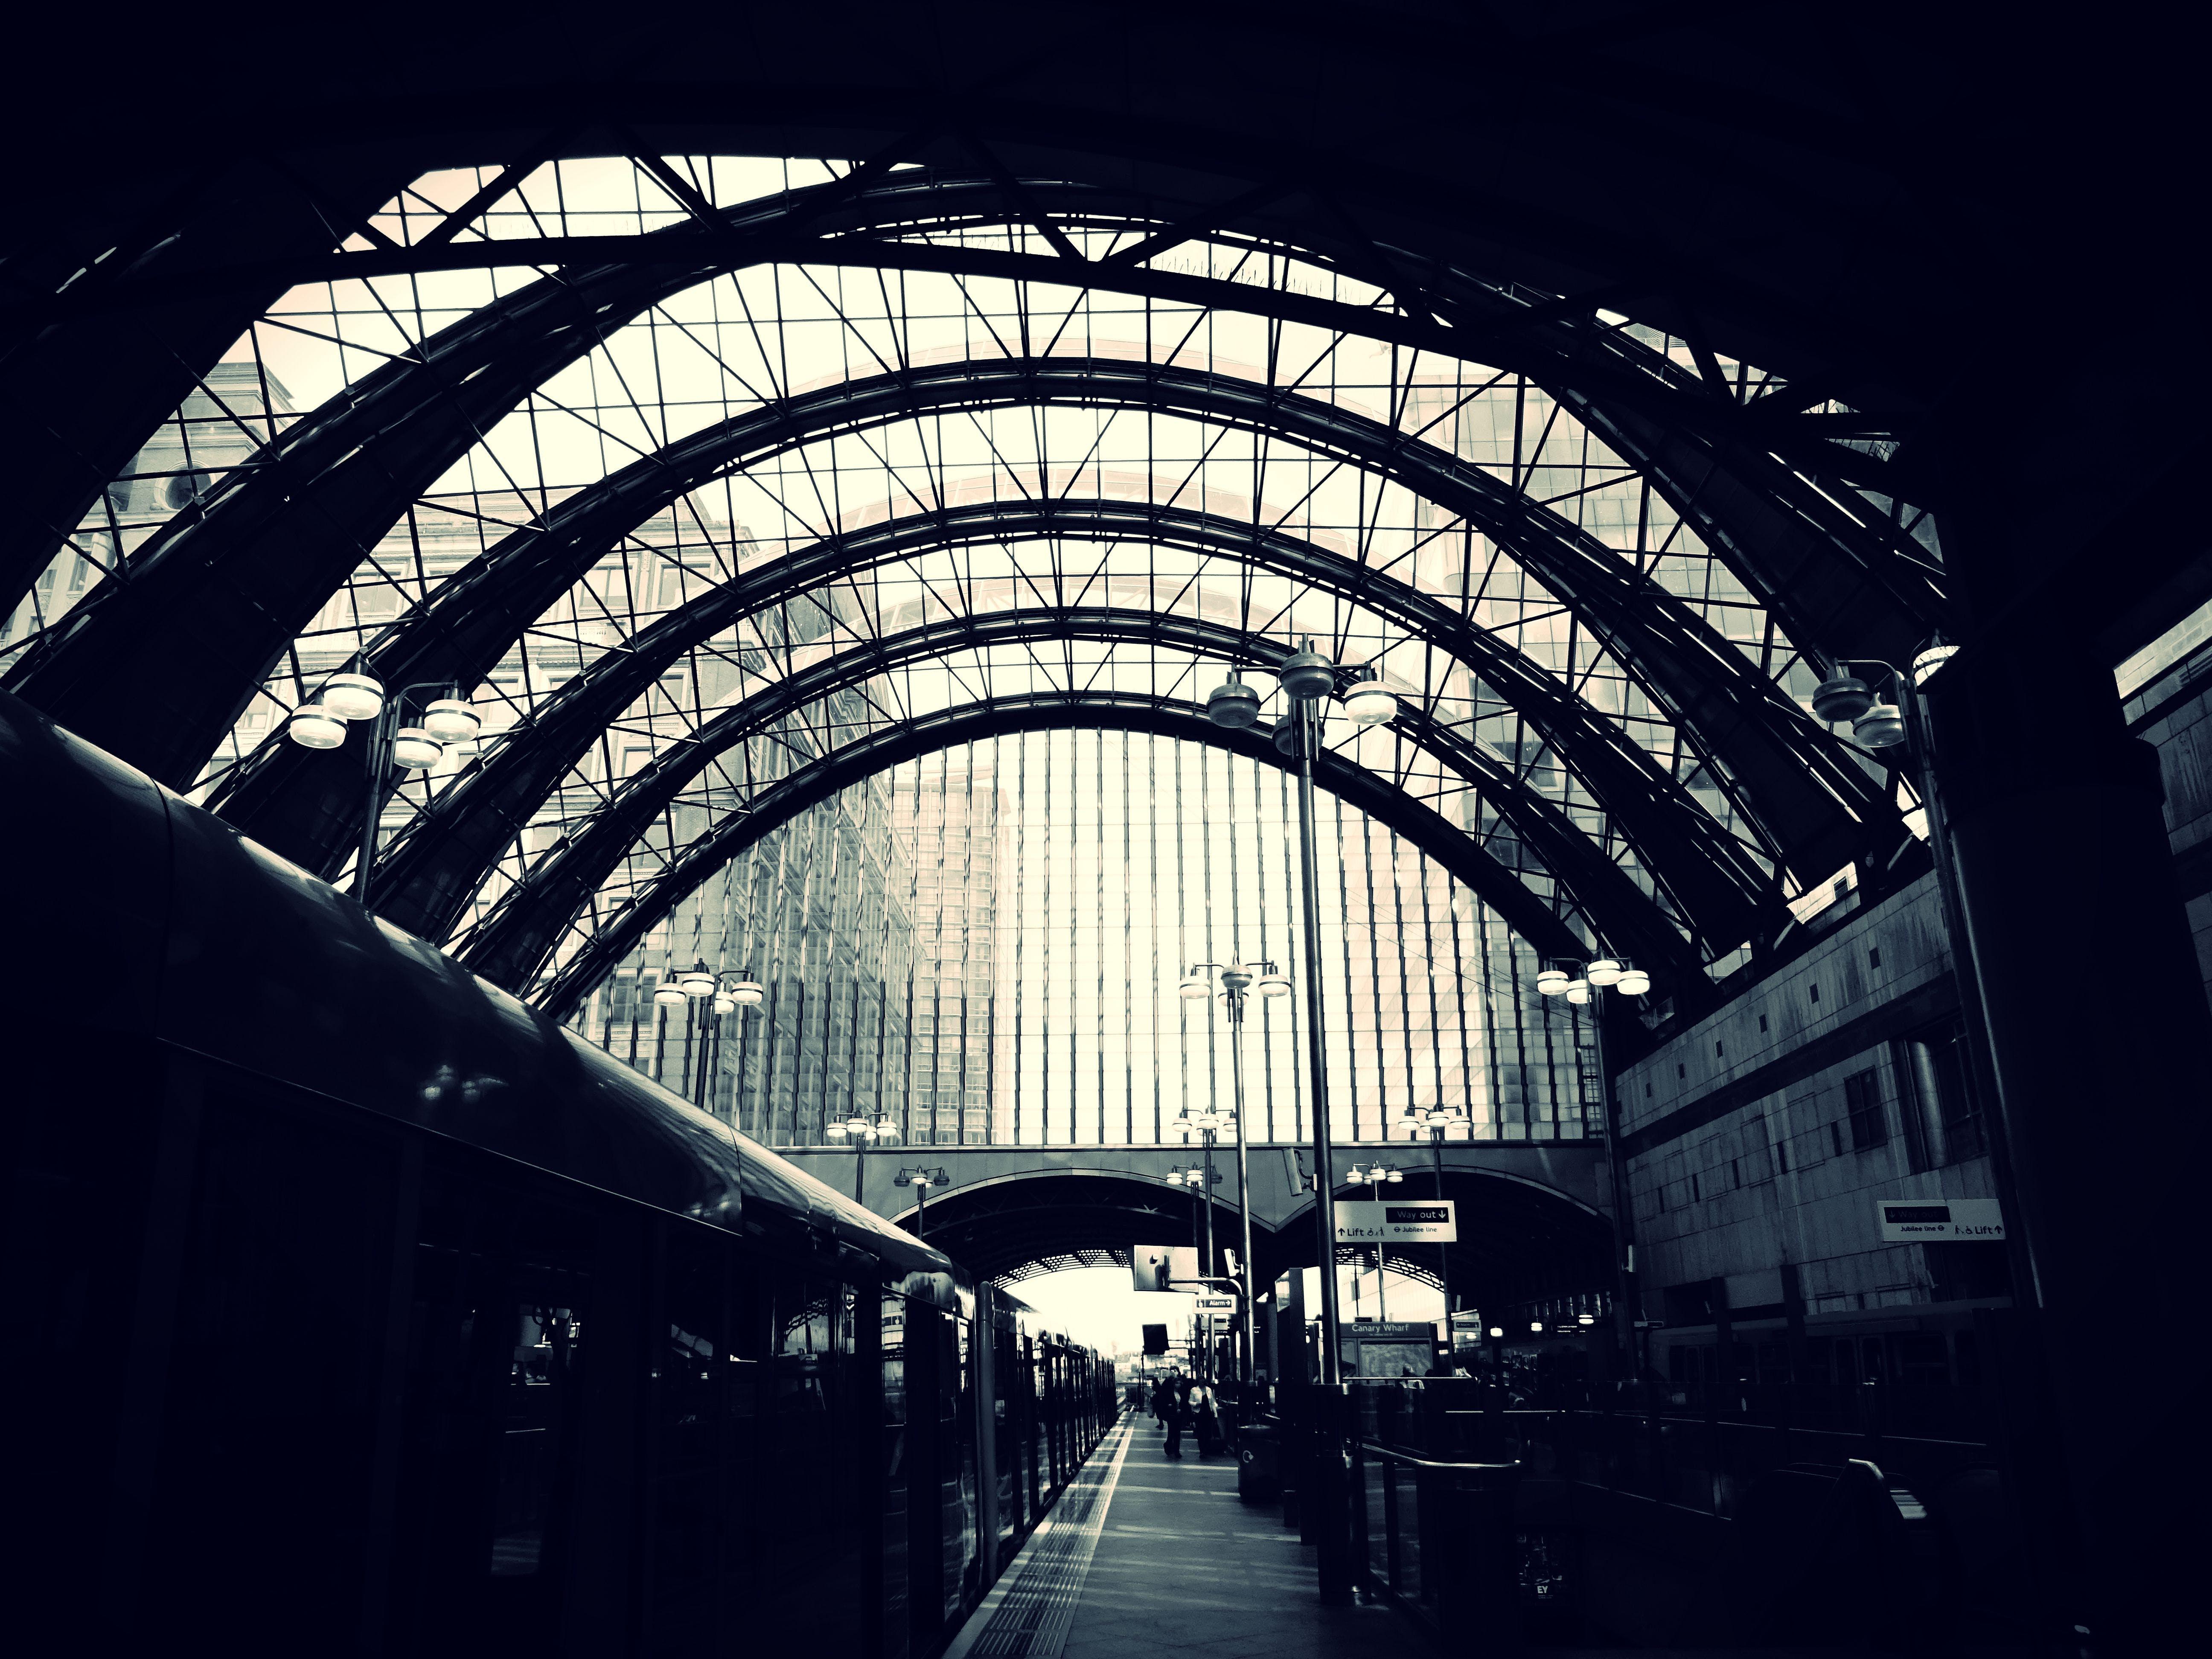 arches, architecture, black and-white